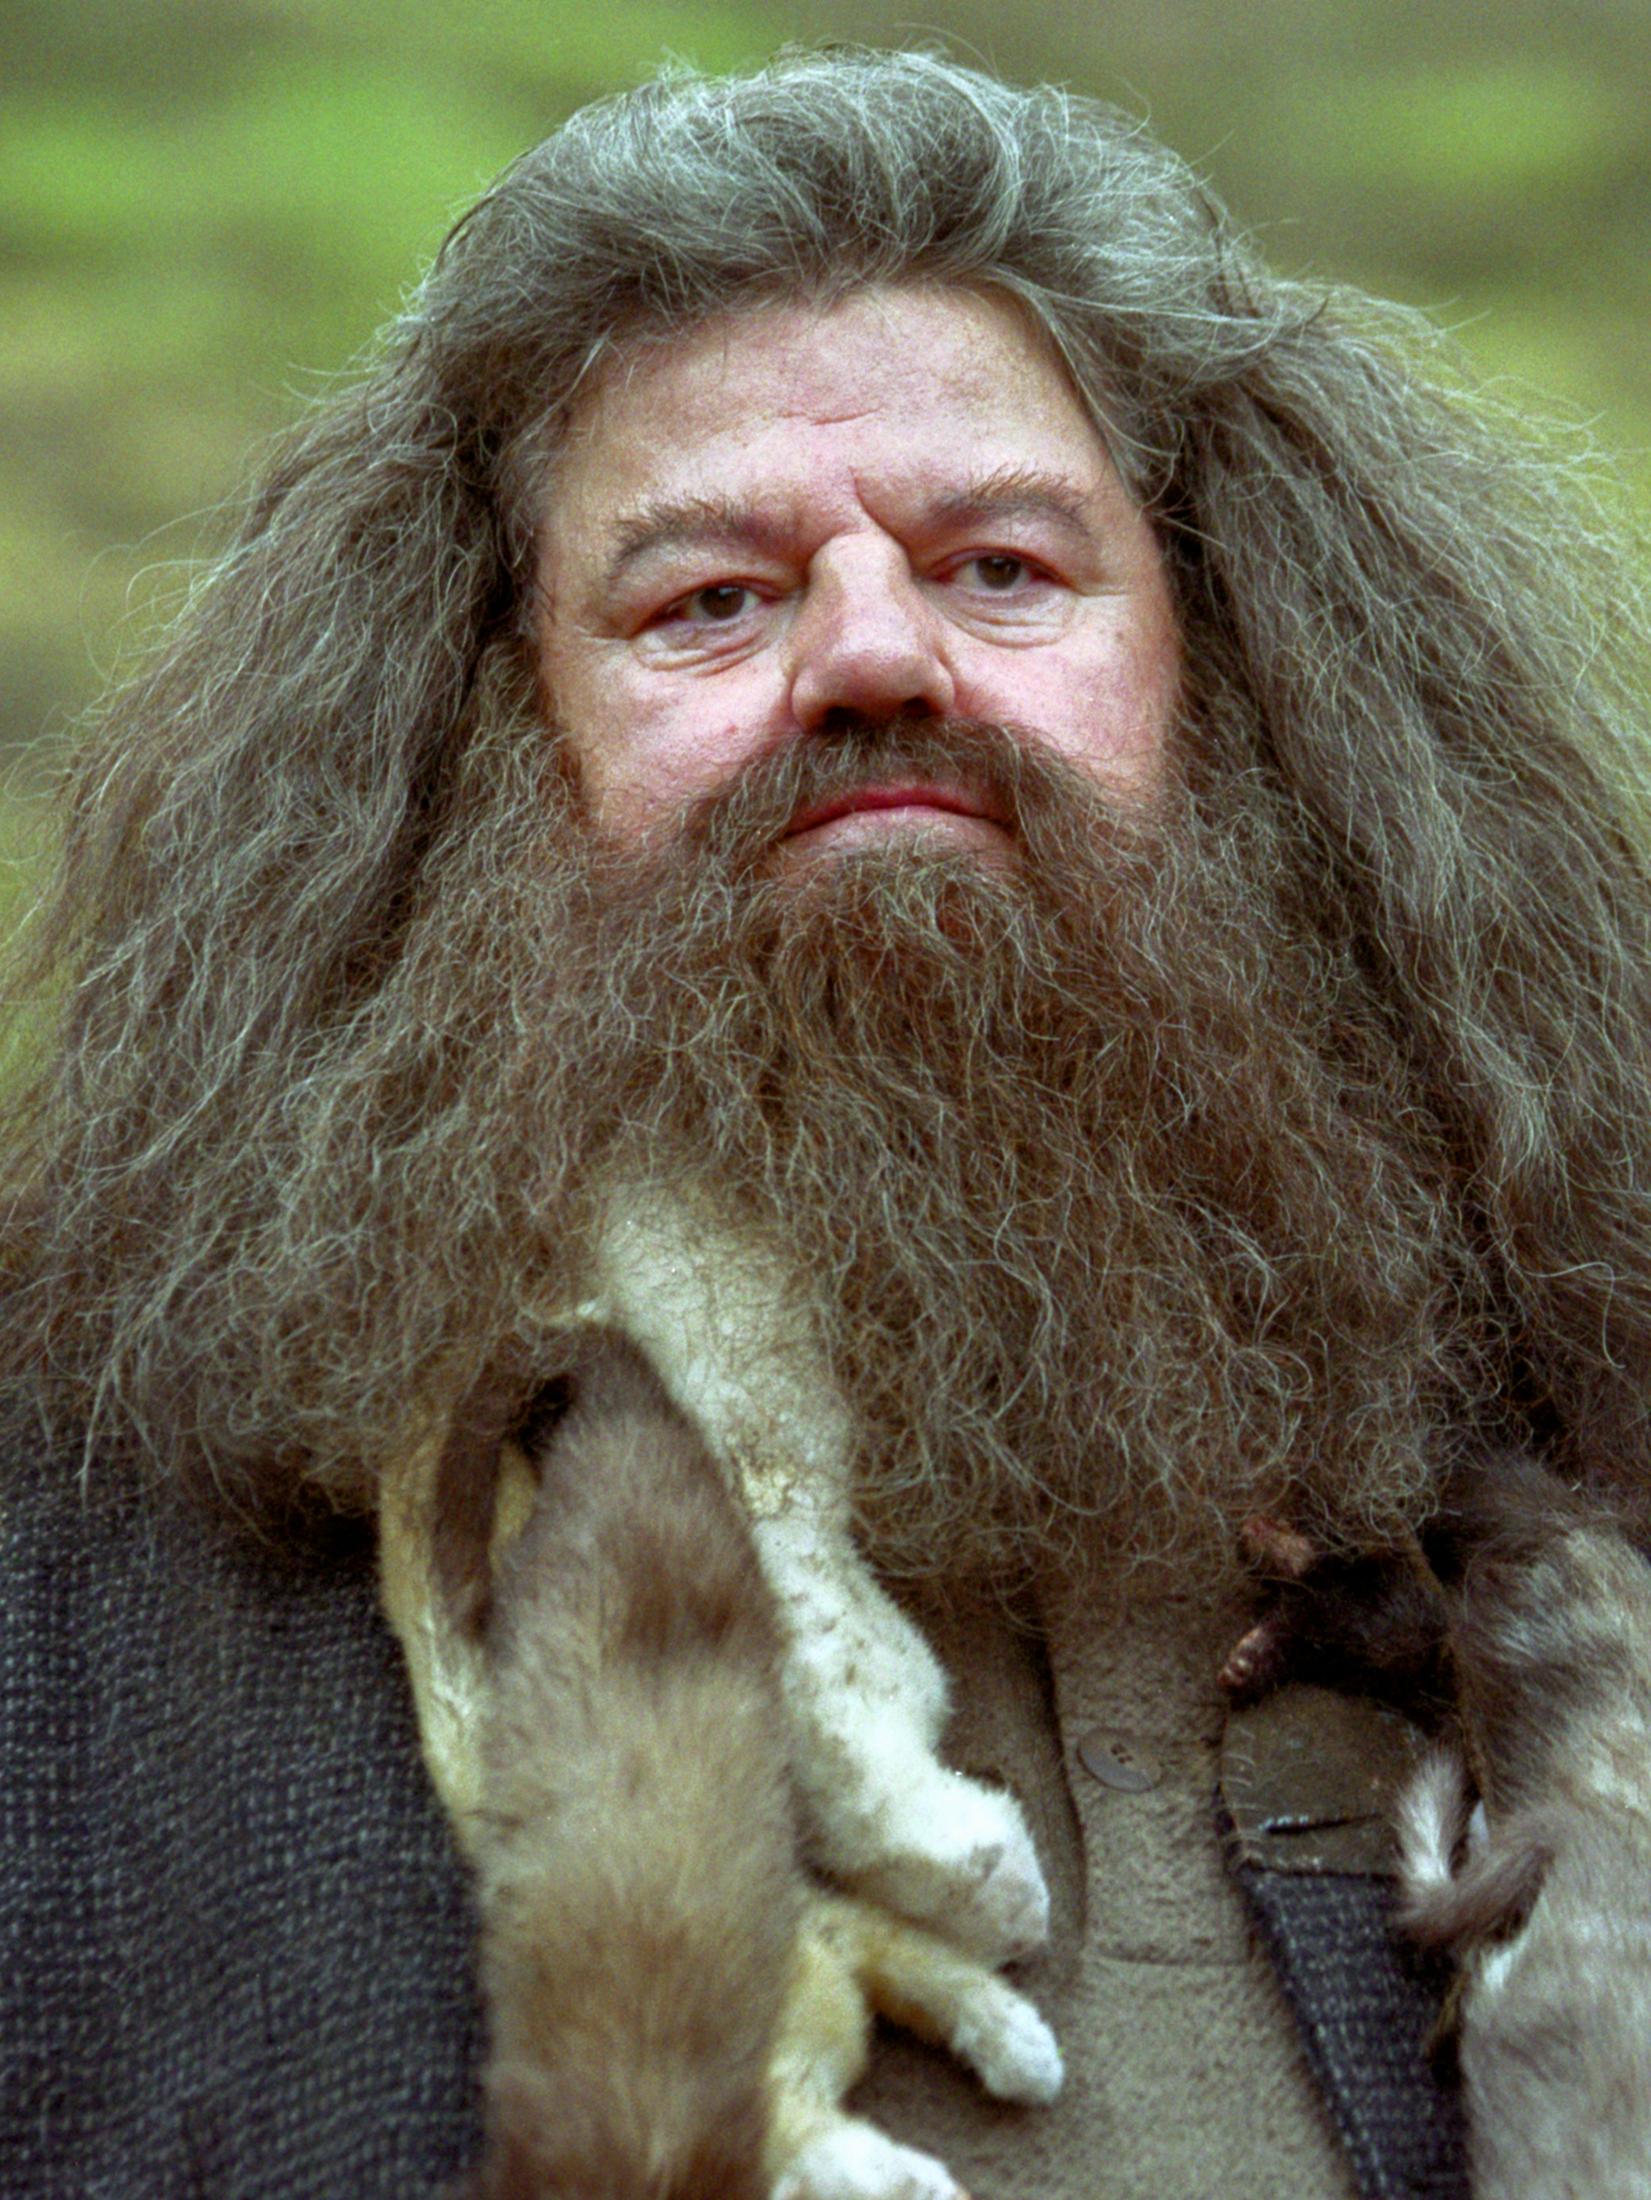 Rubeus Hagrid | Harry Potter Wiki | Fandom